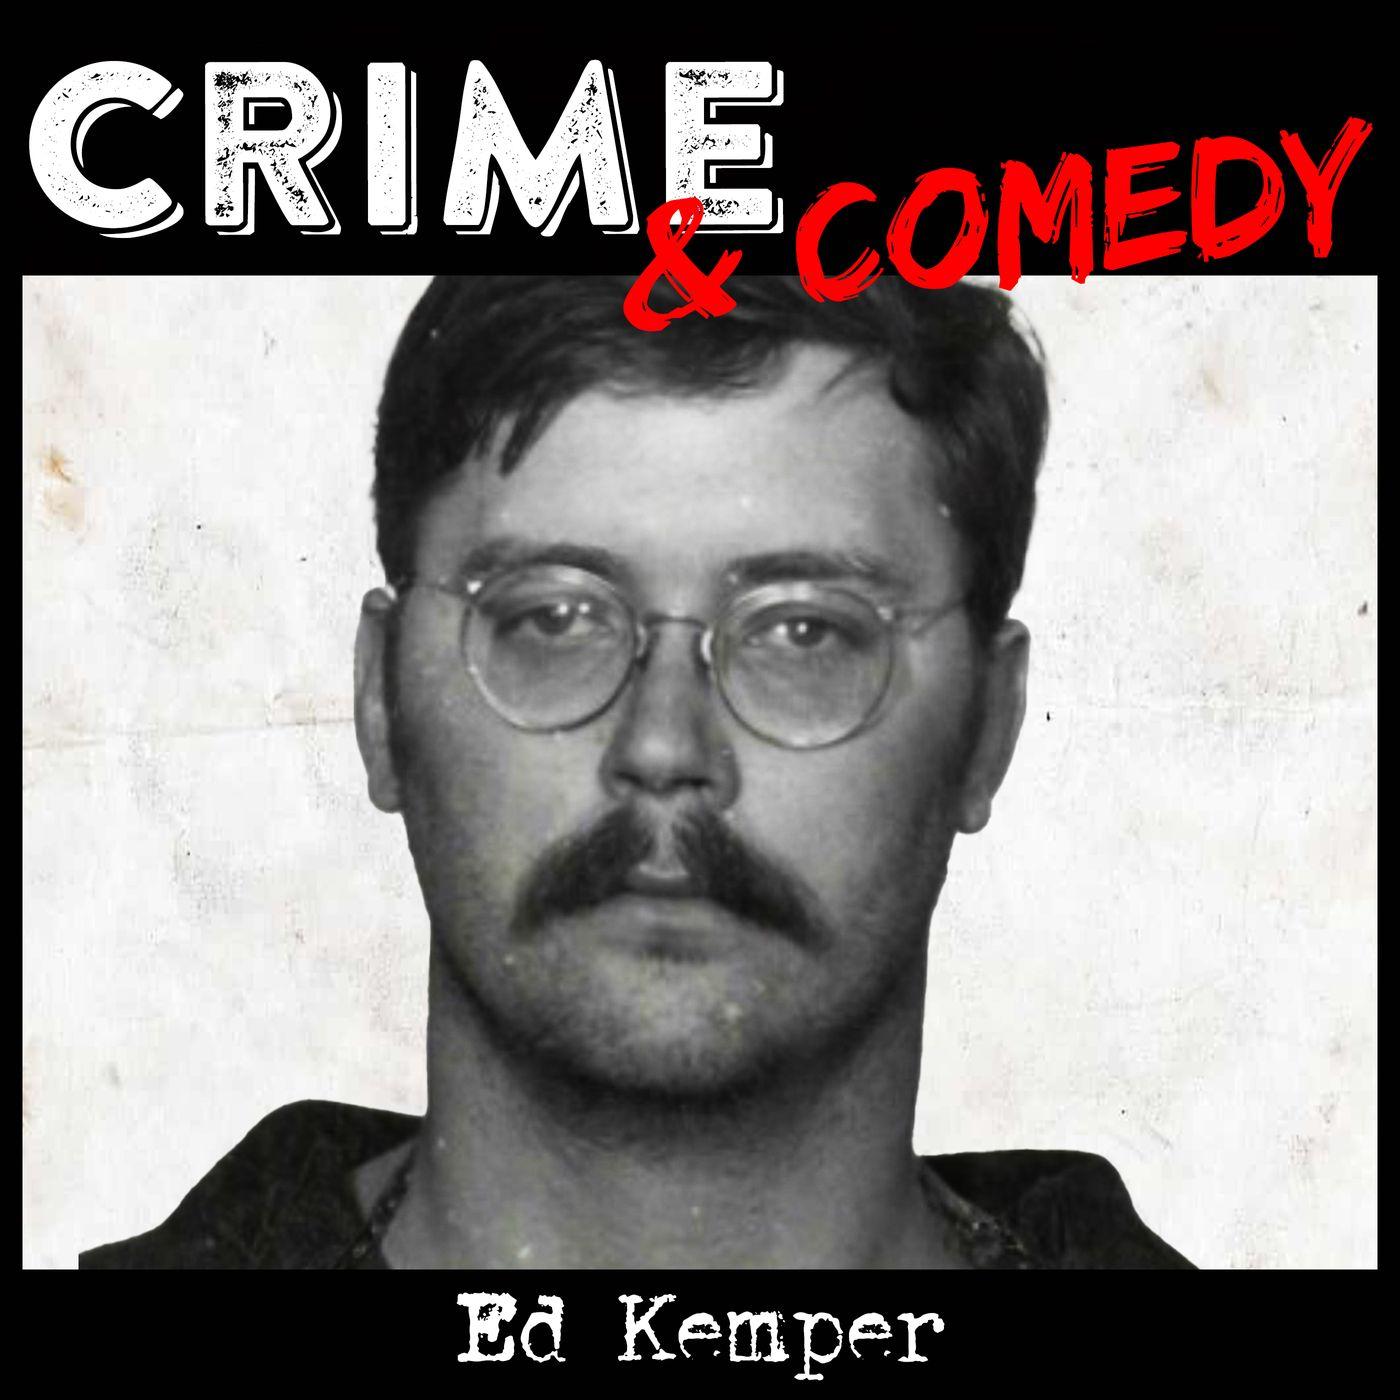 Ed Kemper - The Co-Ed Killer - 24